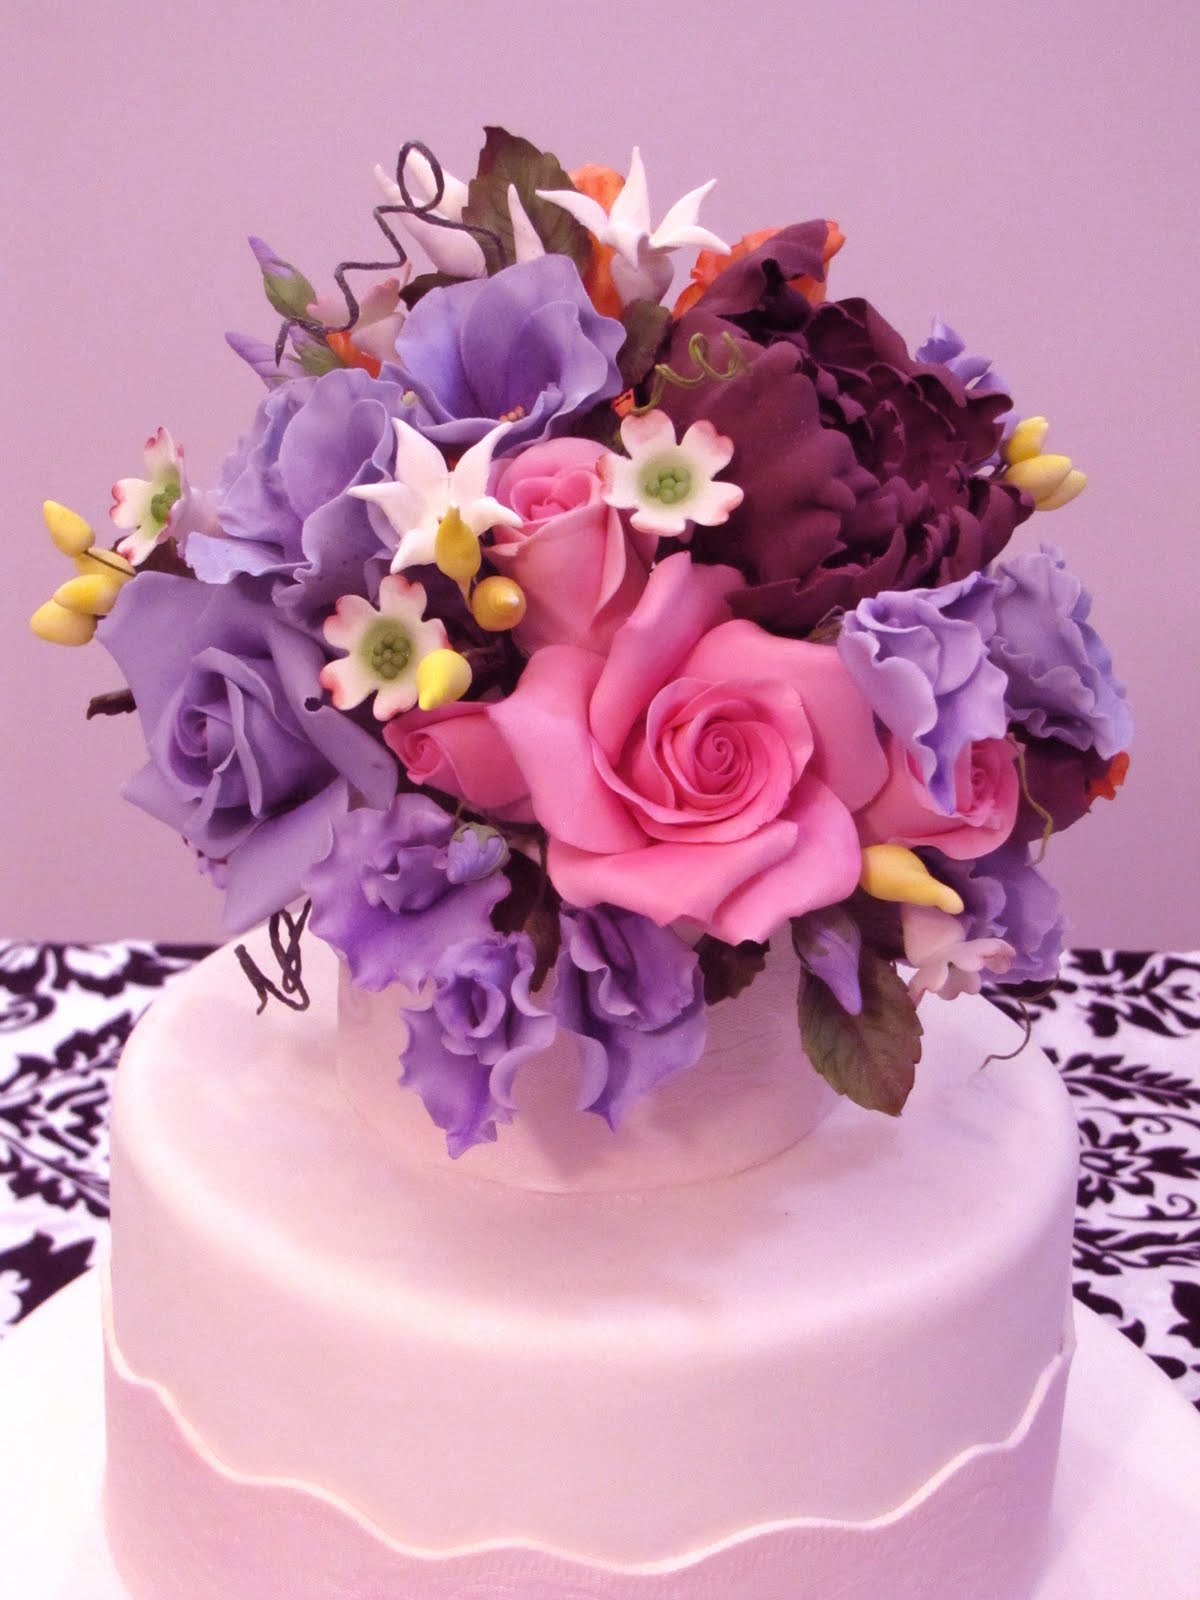 Cake Decorating Blog Ron Ben Israel Styled Wedding Cake - Ben Israel Wedding Cakes